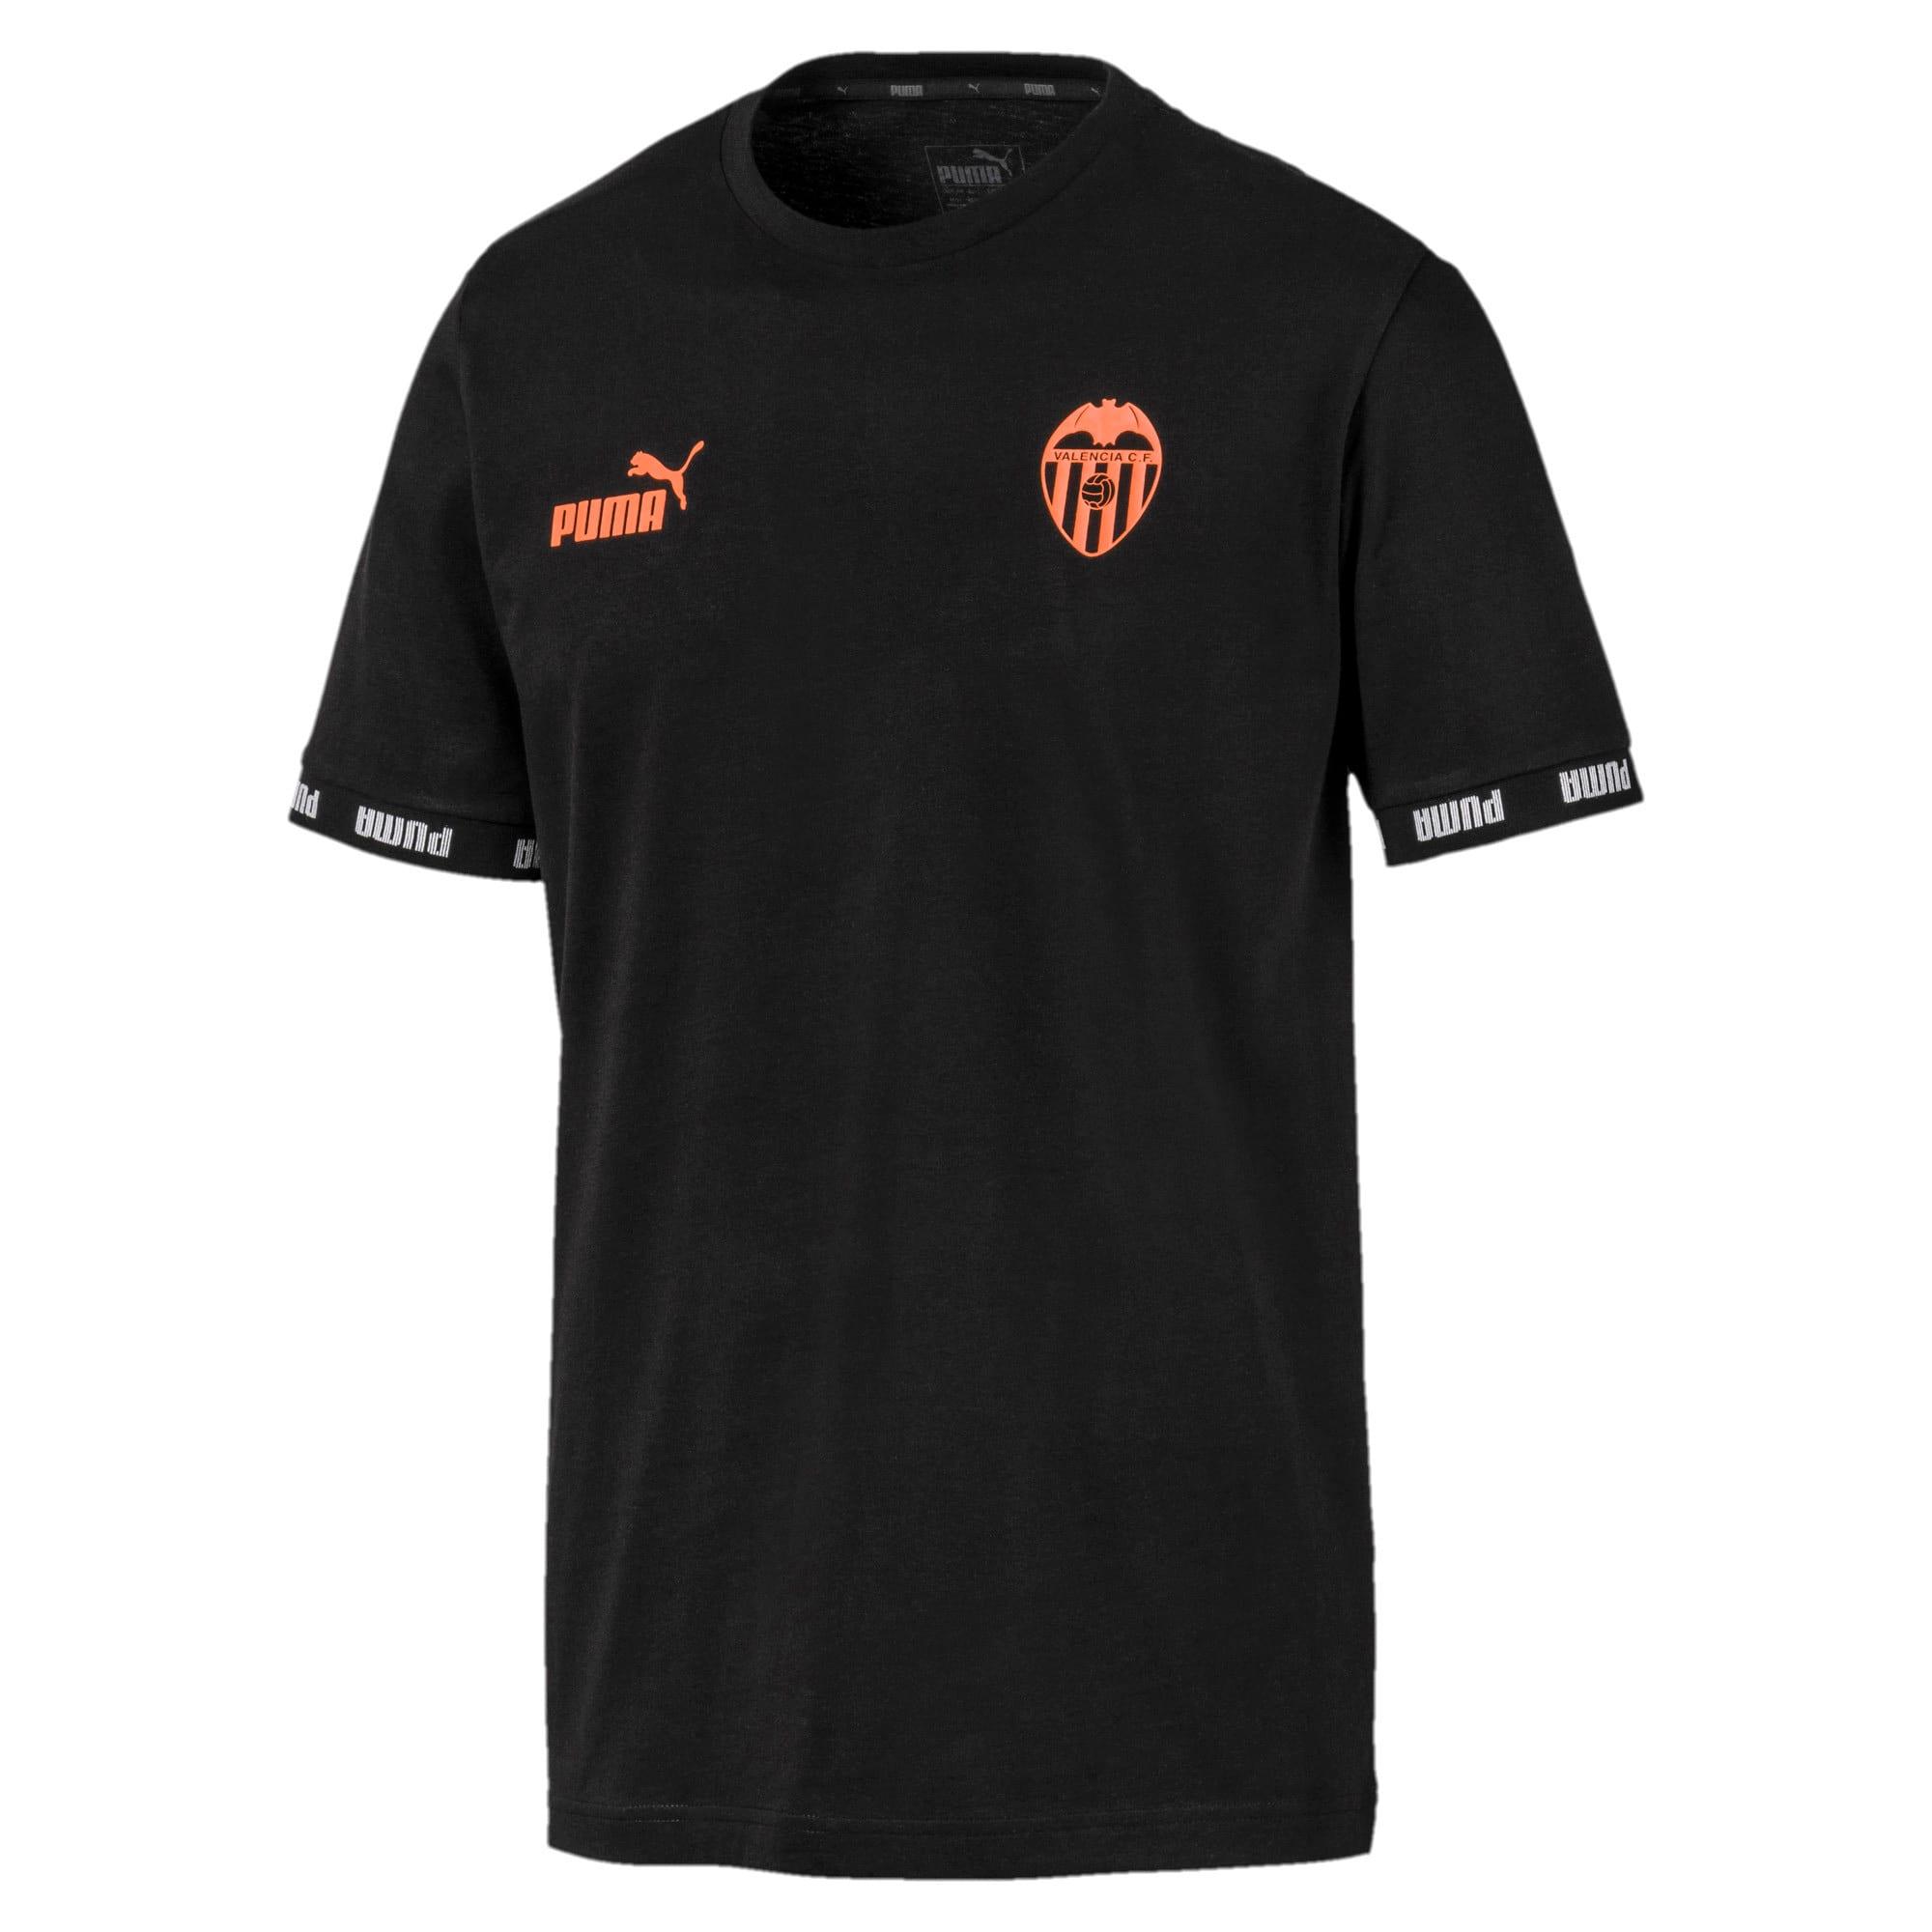 Thumbnail 1 of Valencia CF Football Culture Men's Tee, Puma Black, medium